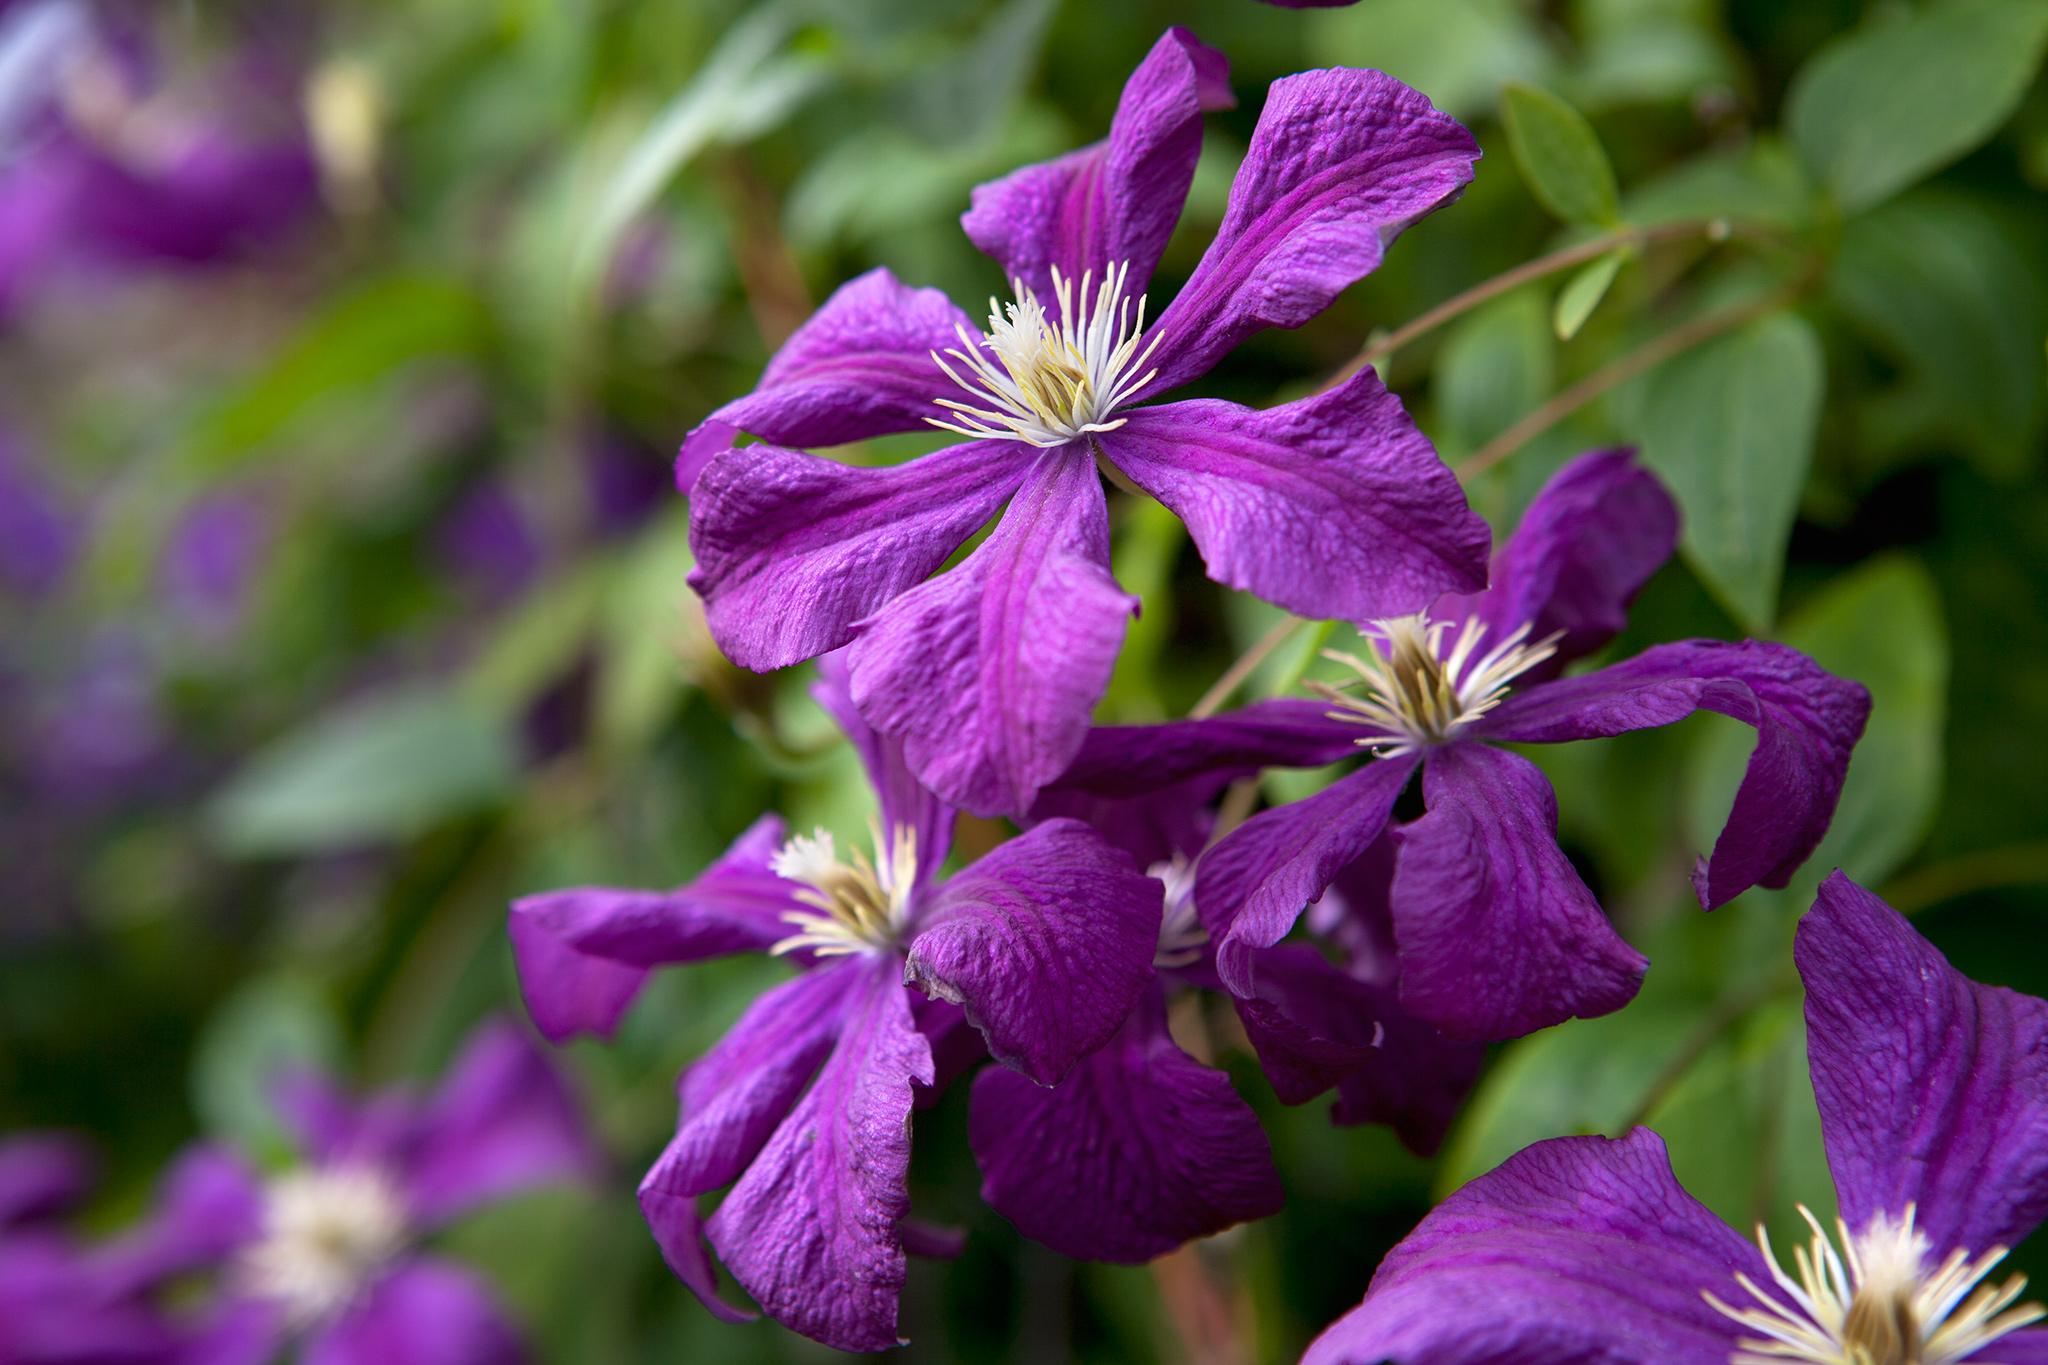 clematis-viticella-etoile-violette-5